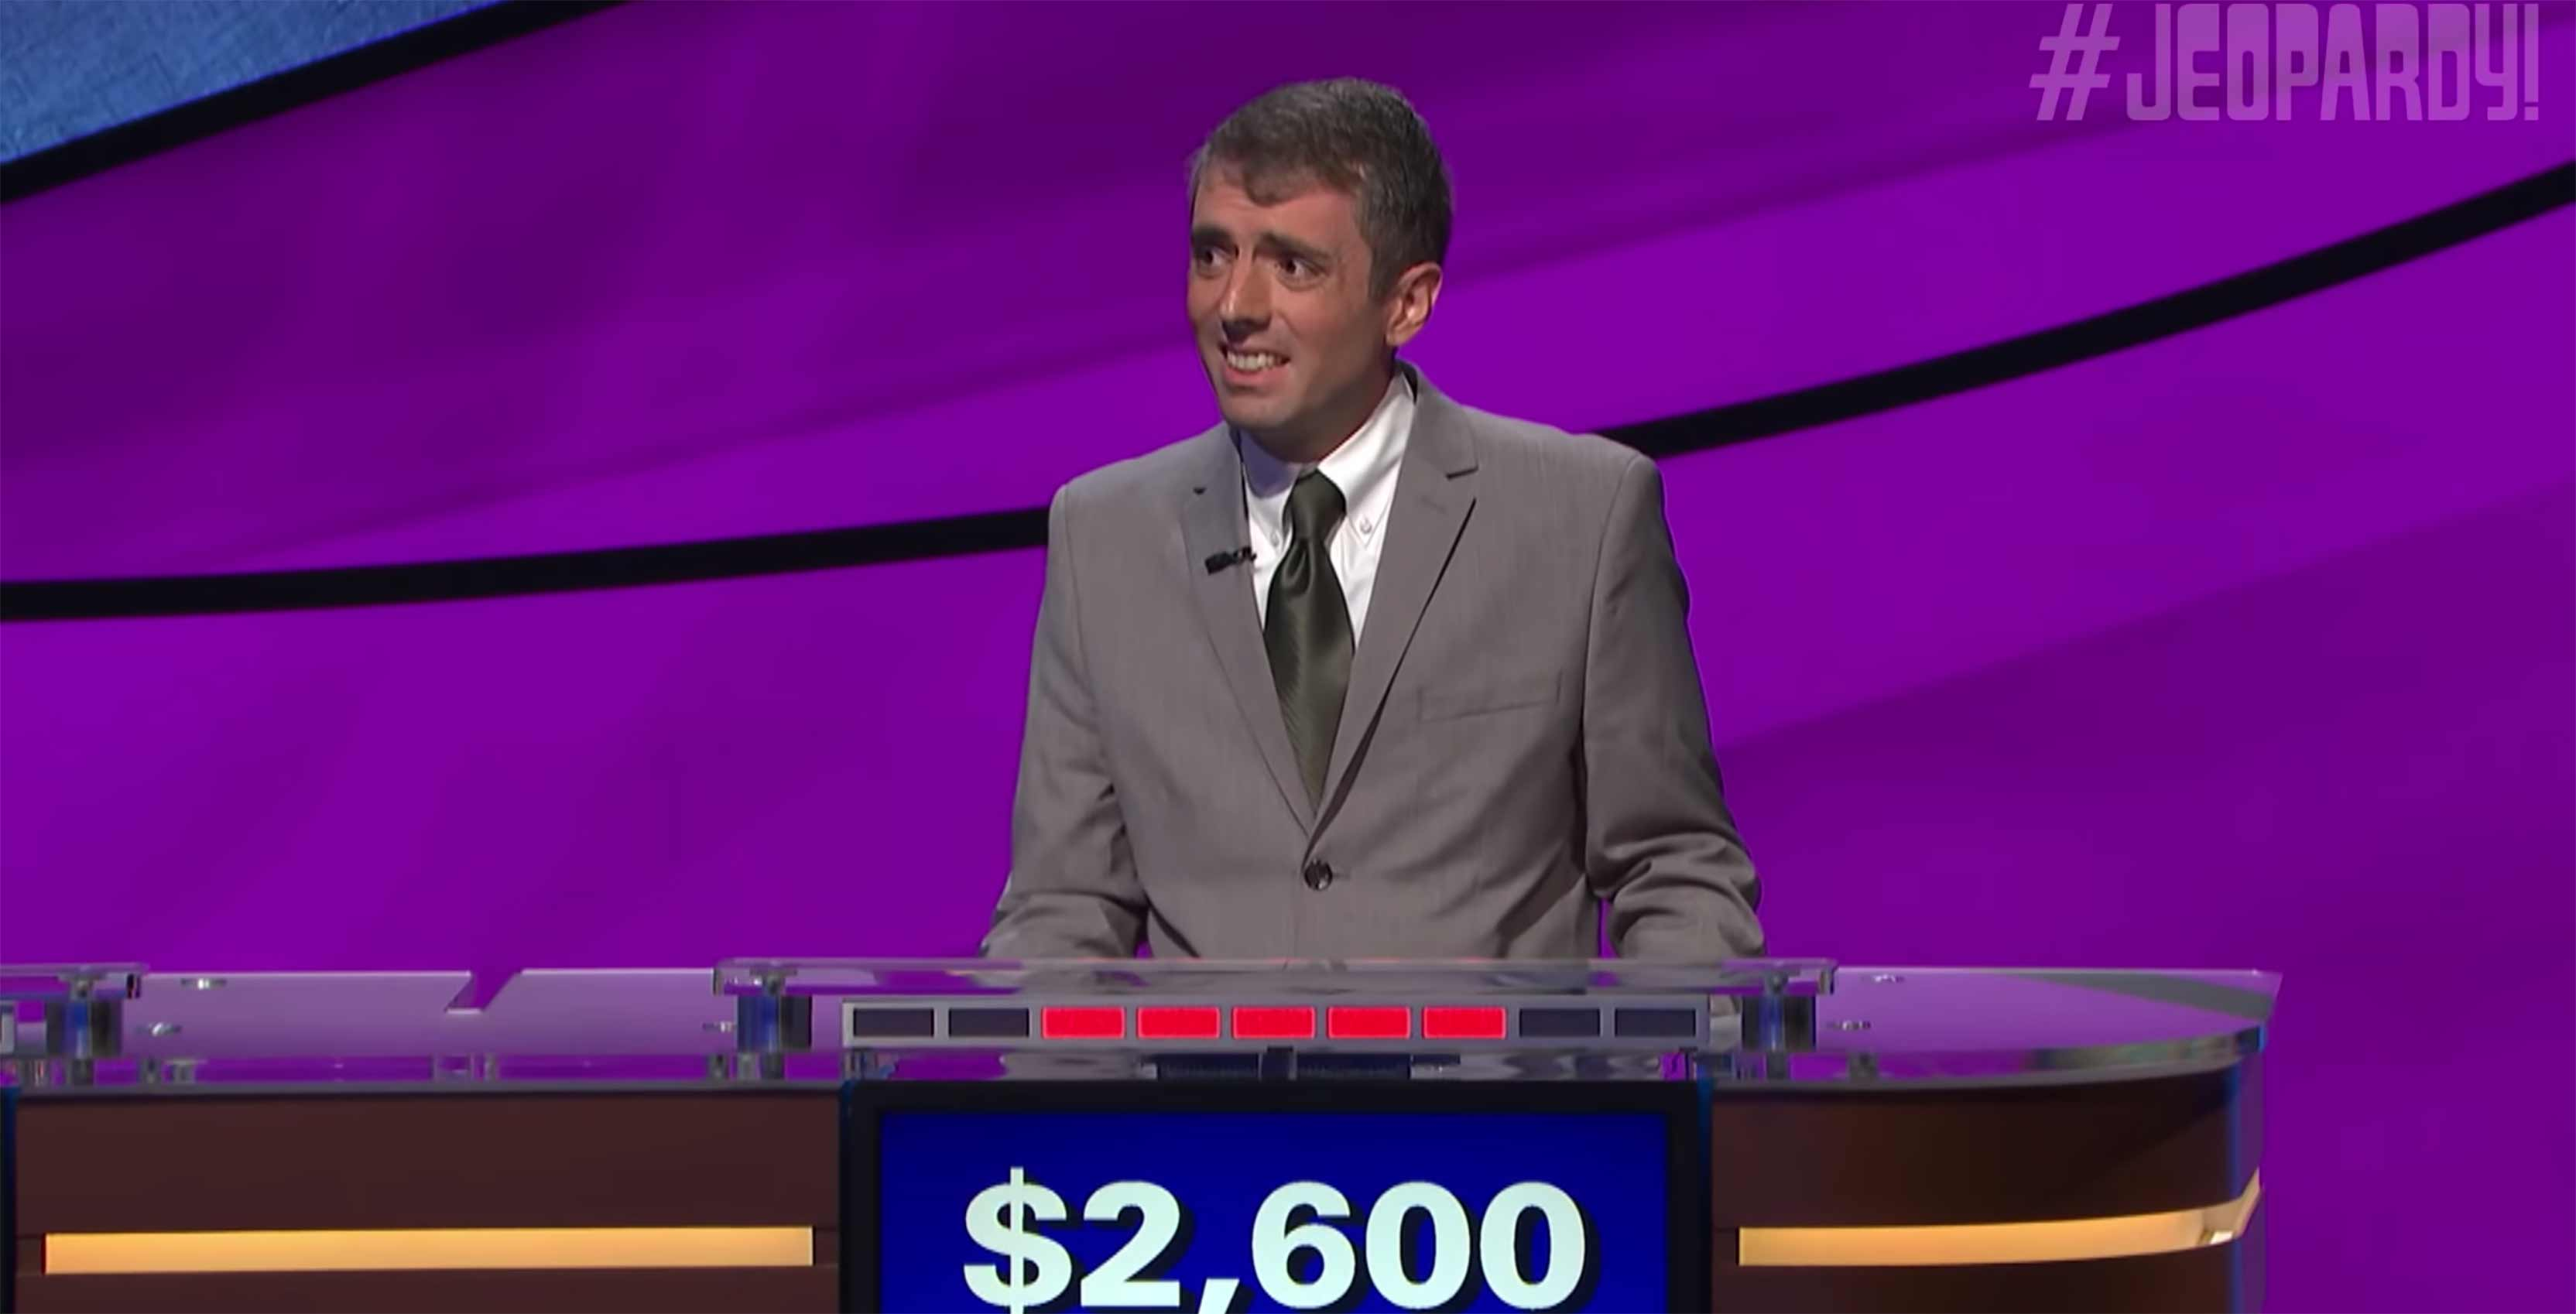 Jeopardy! contestant